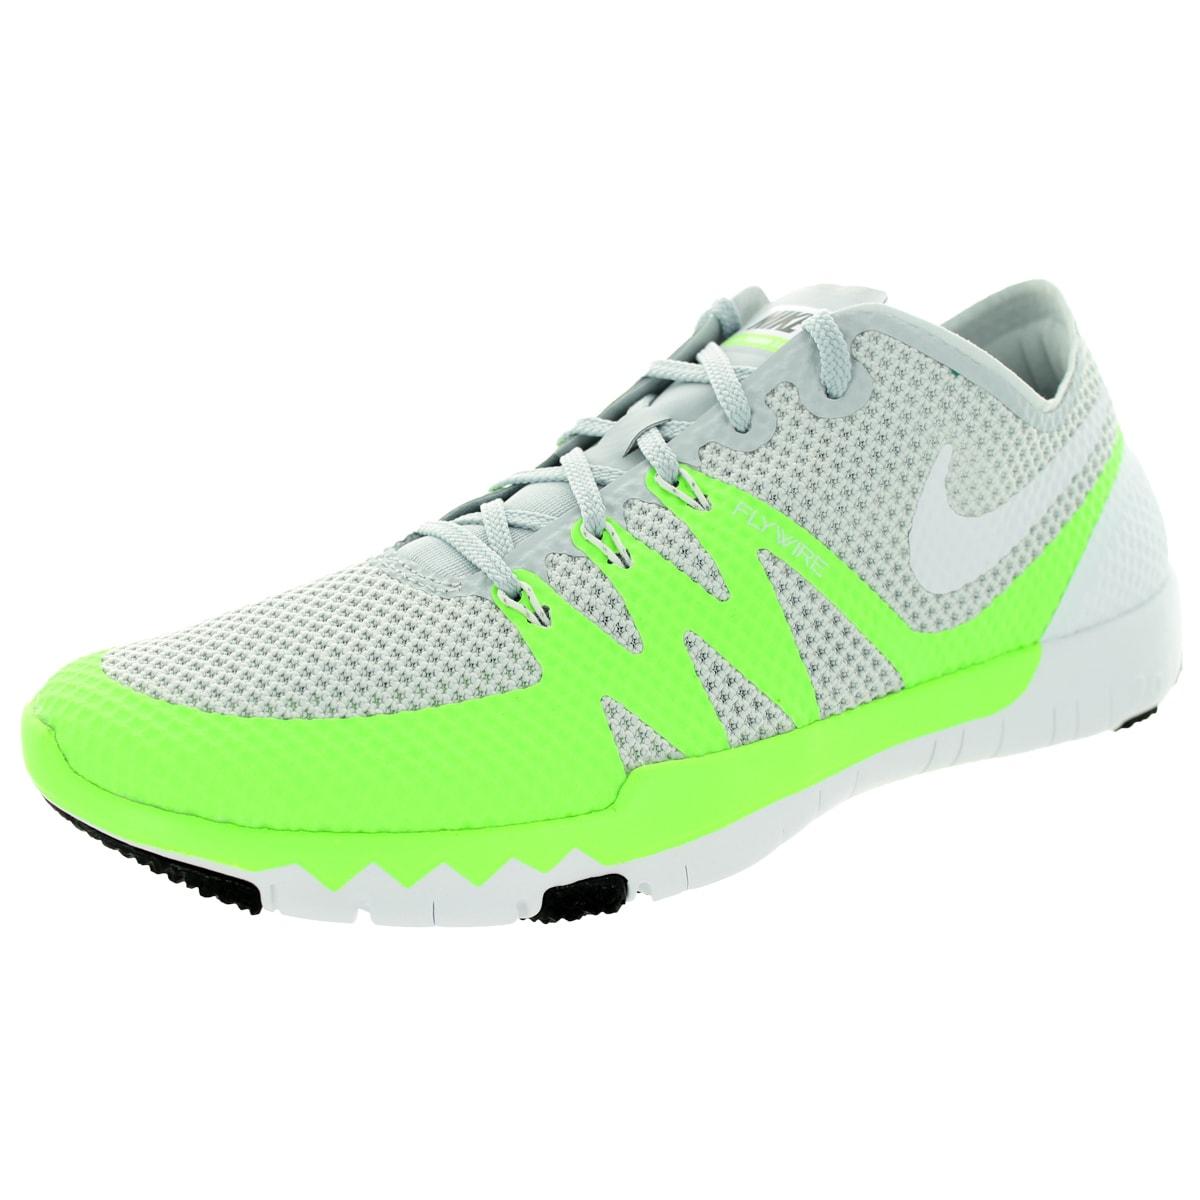 Nike Trainer 3.0 V3 Running Shoes 705270-013 Platinum Whi...